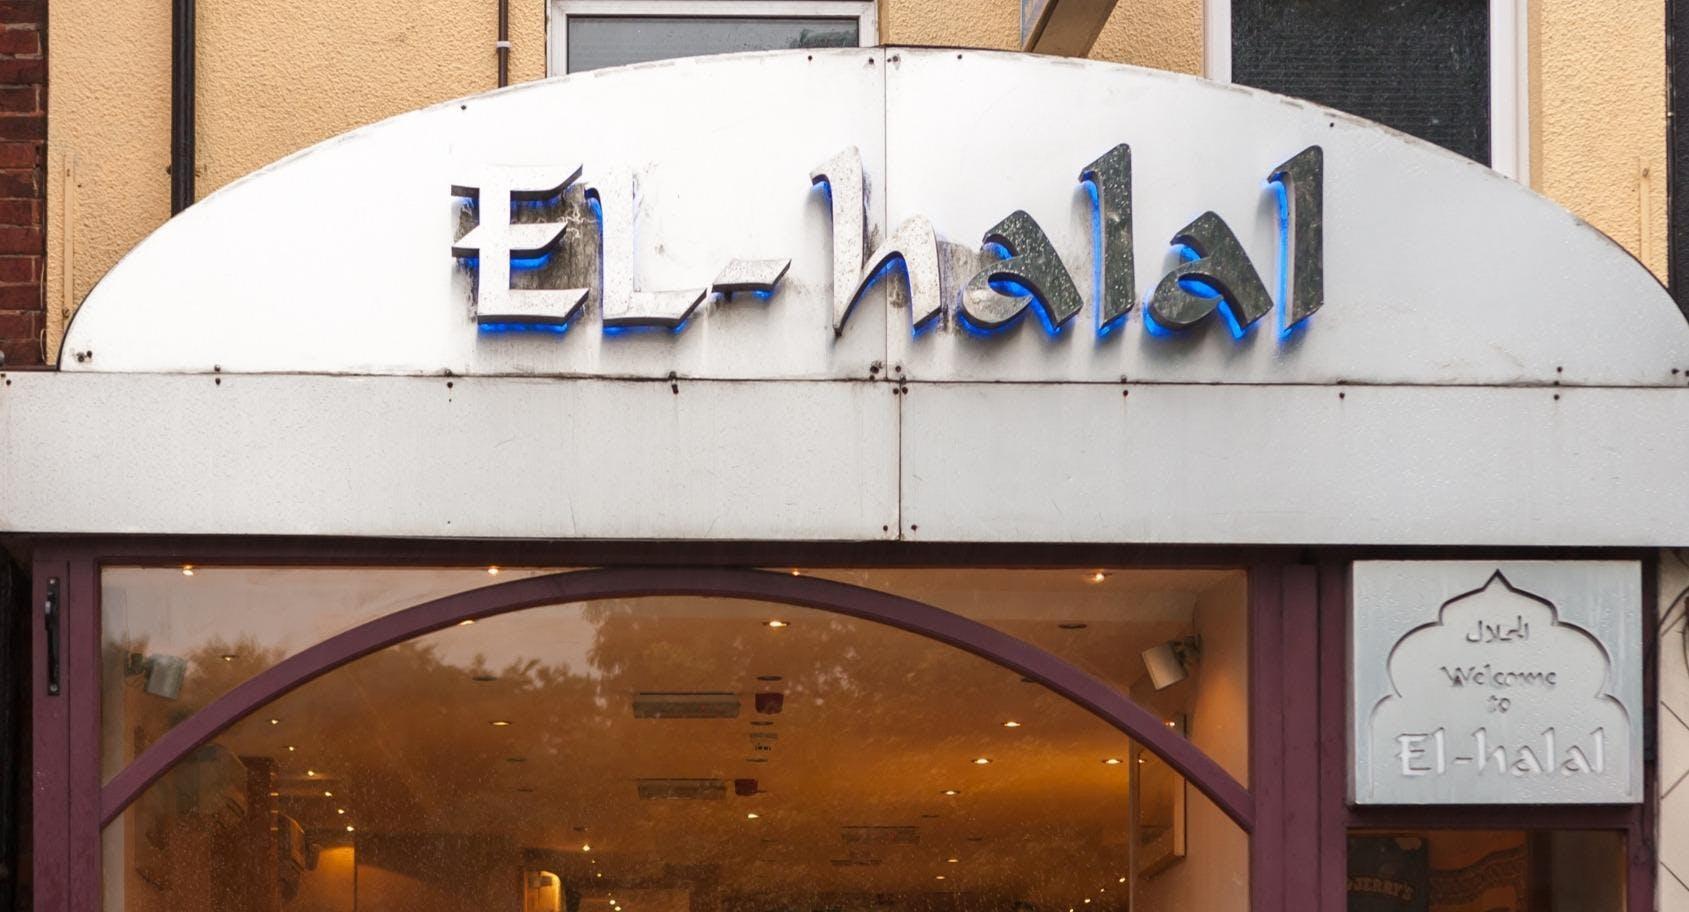 El Halal